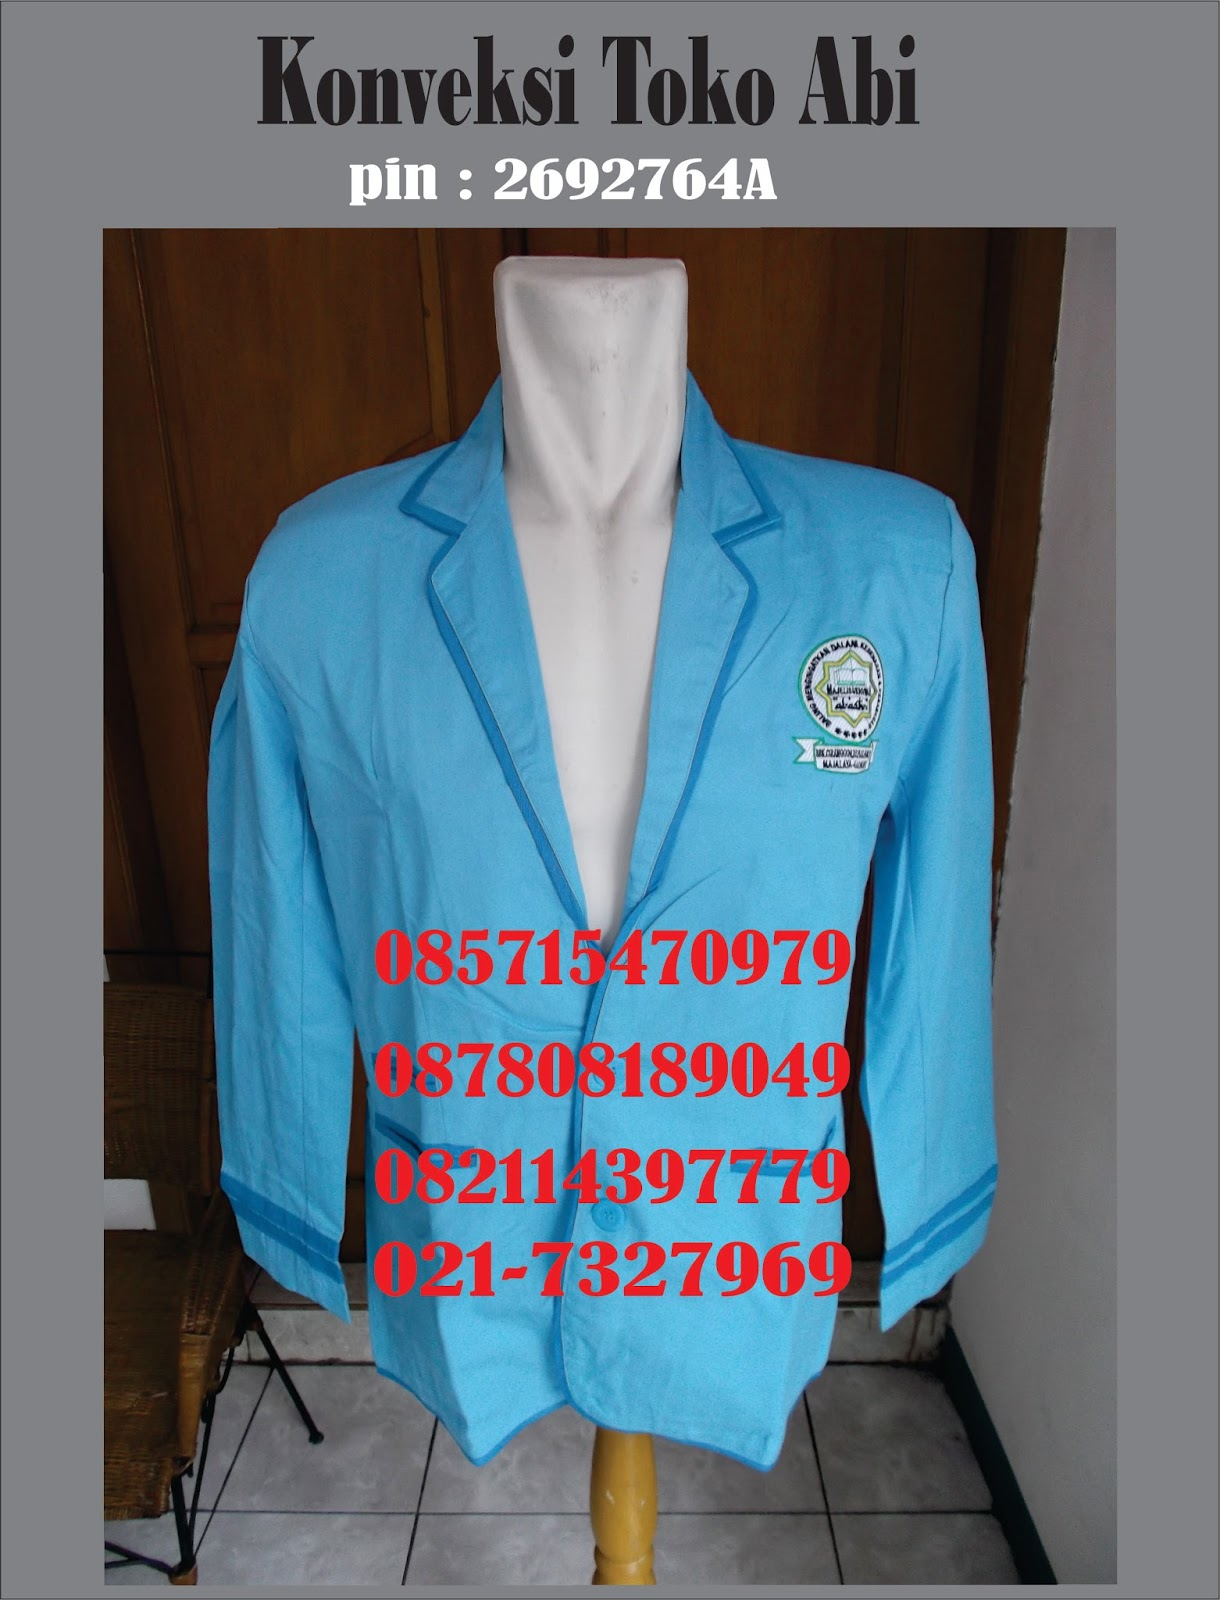 Tempat Pembuatan Jaket Almamater Di Jakarta | Whatsapp. 0857-7106-2589 | Telp. 0857-1547-0979